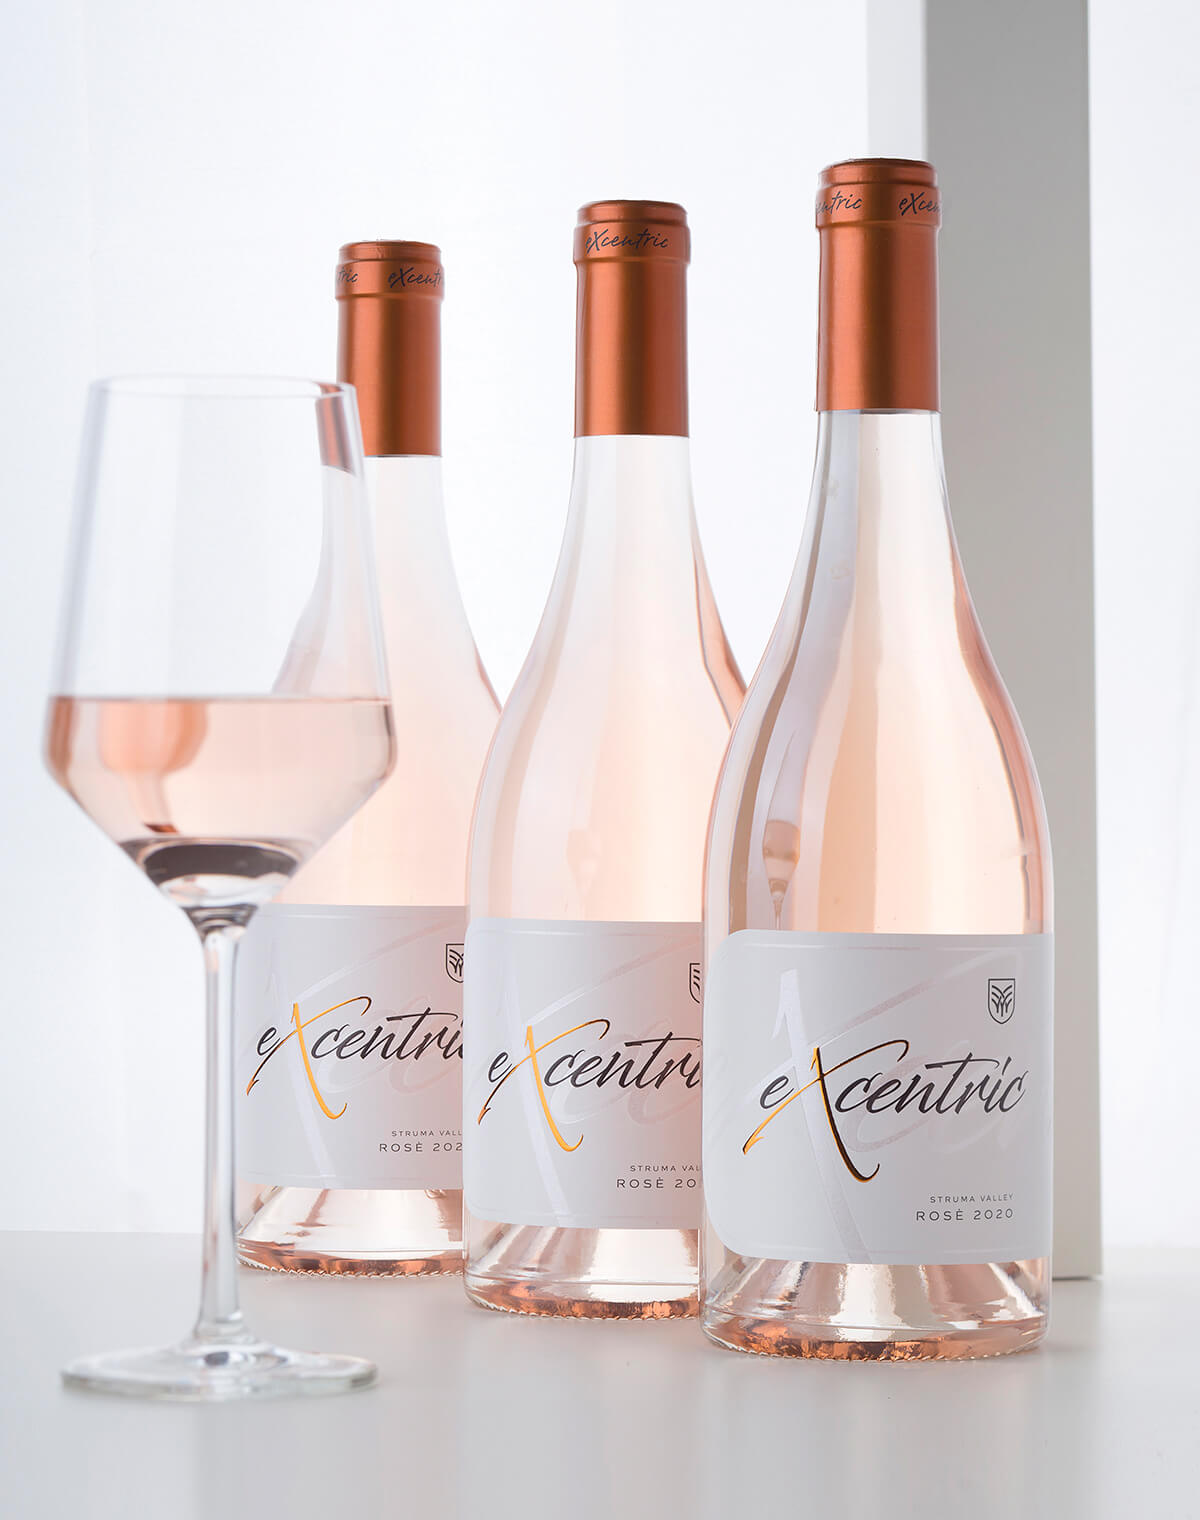 excentric wine label